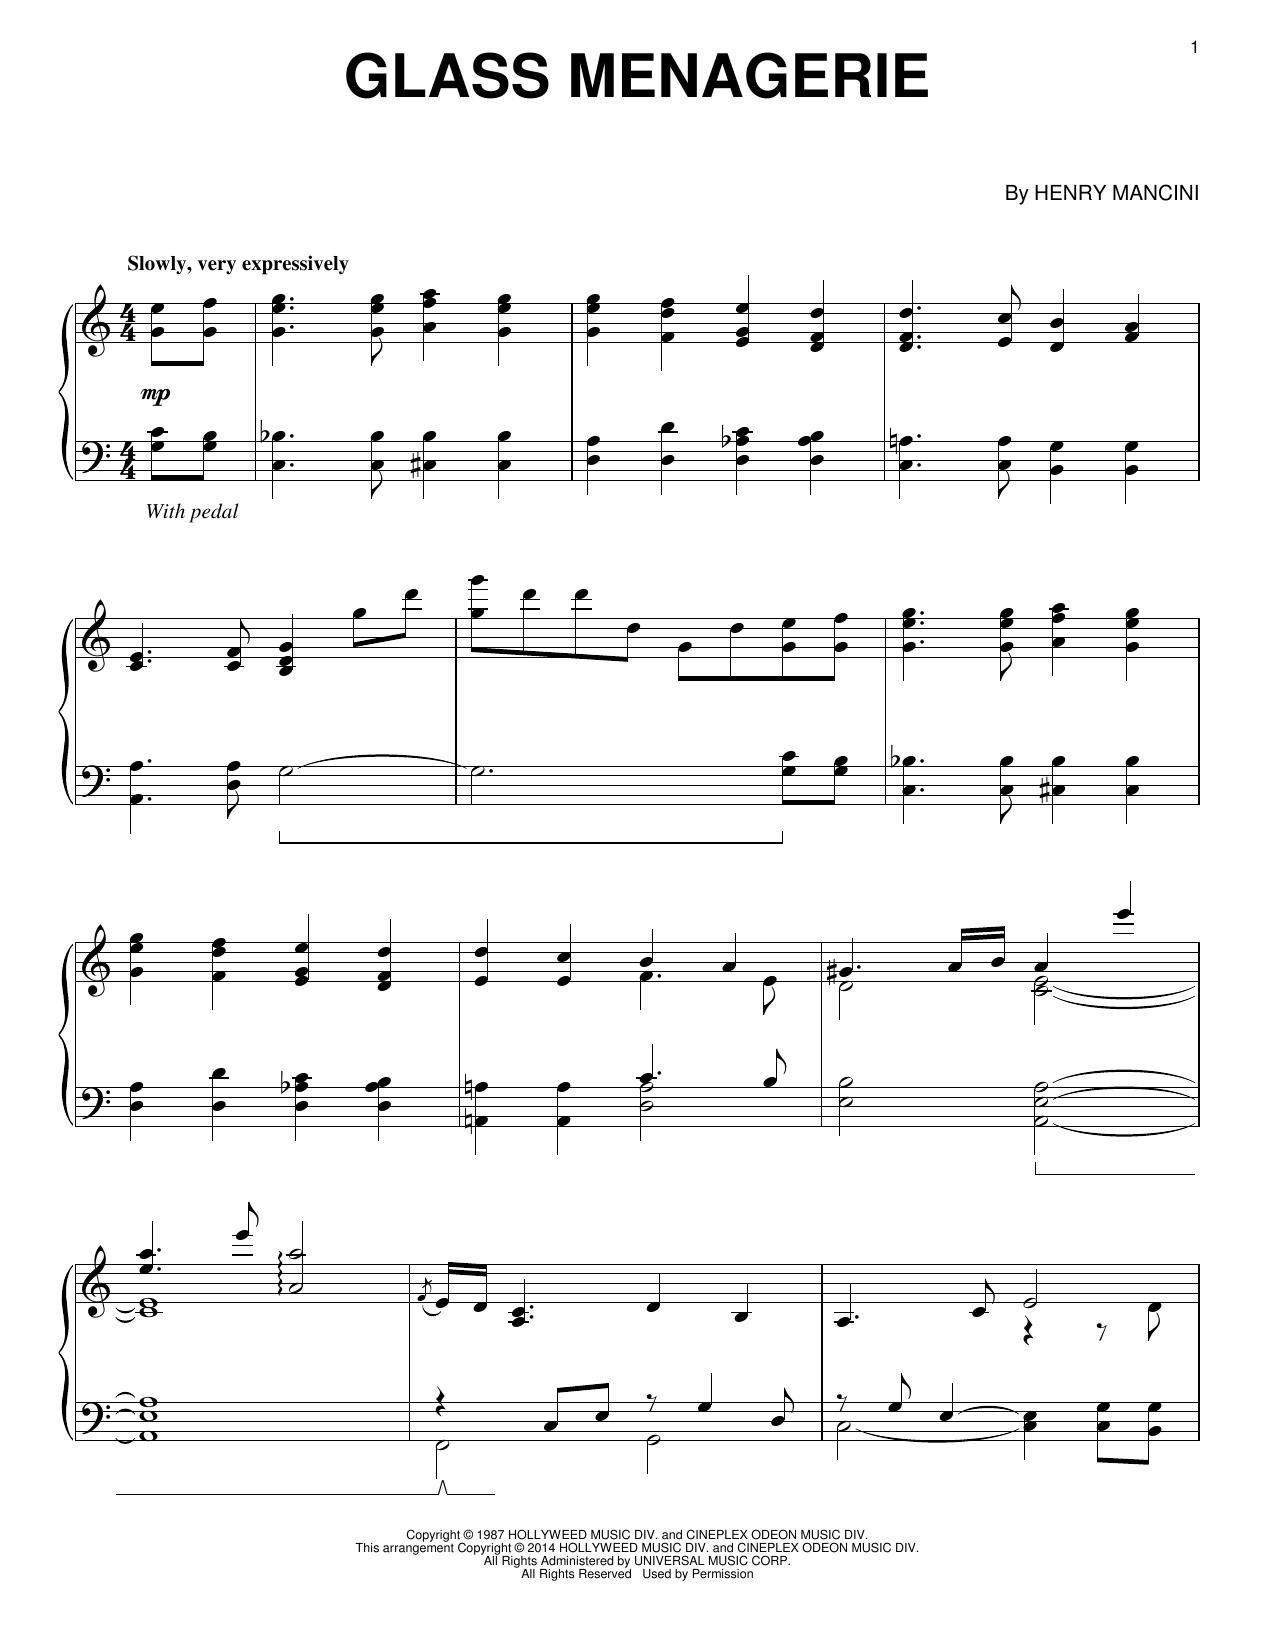 Glass Menagerie Sheet Music